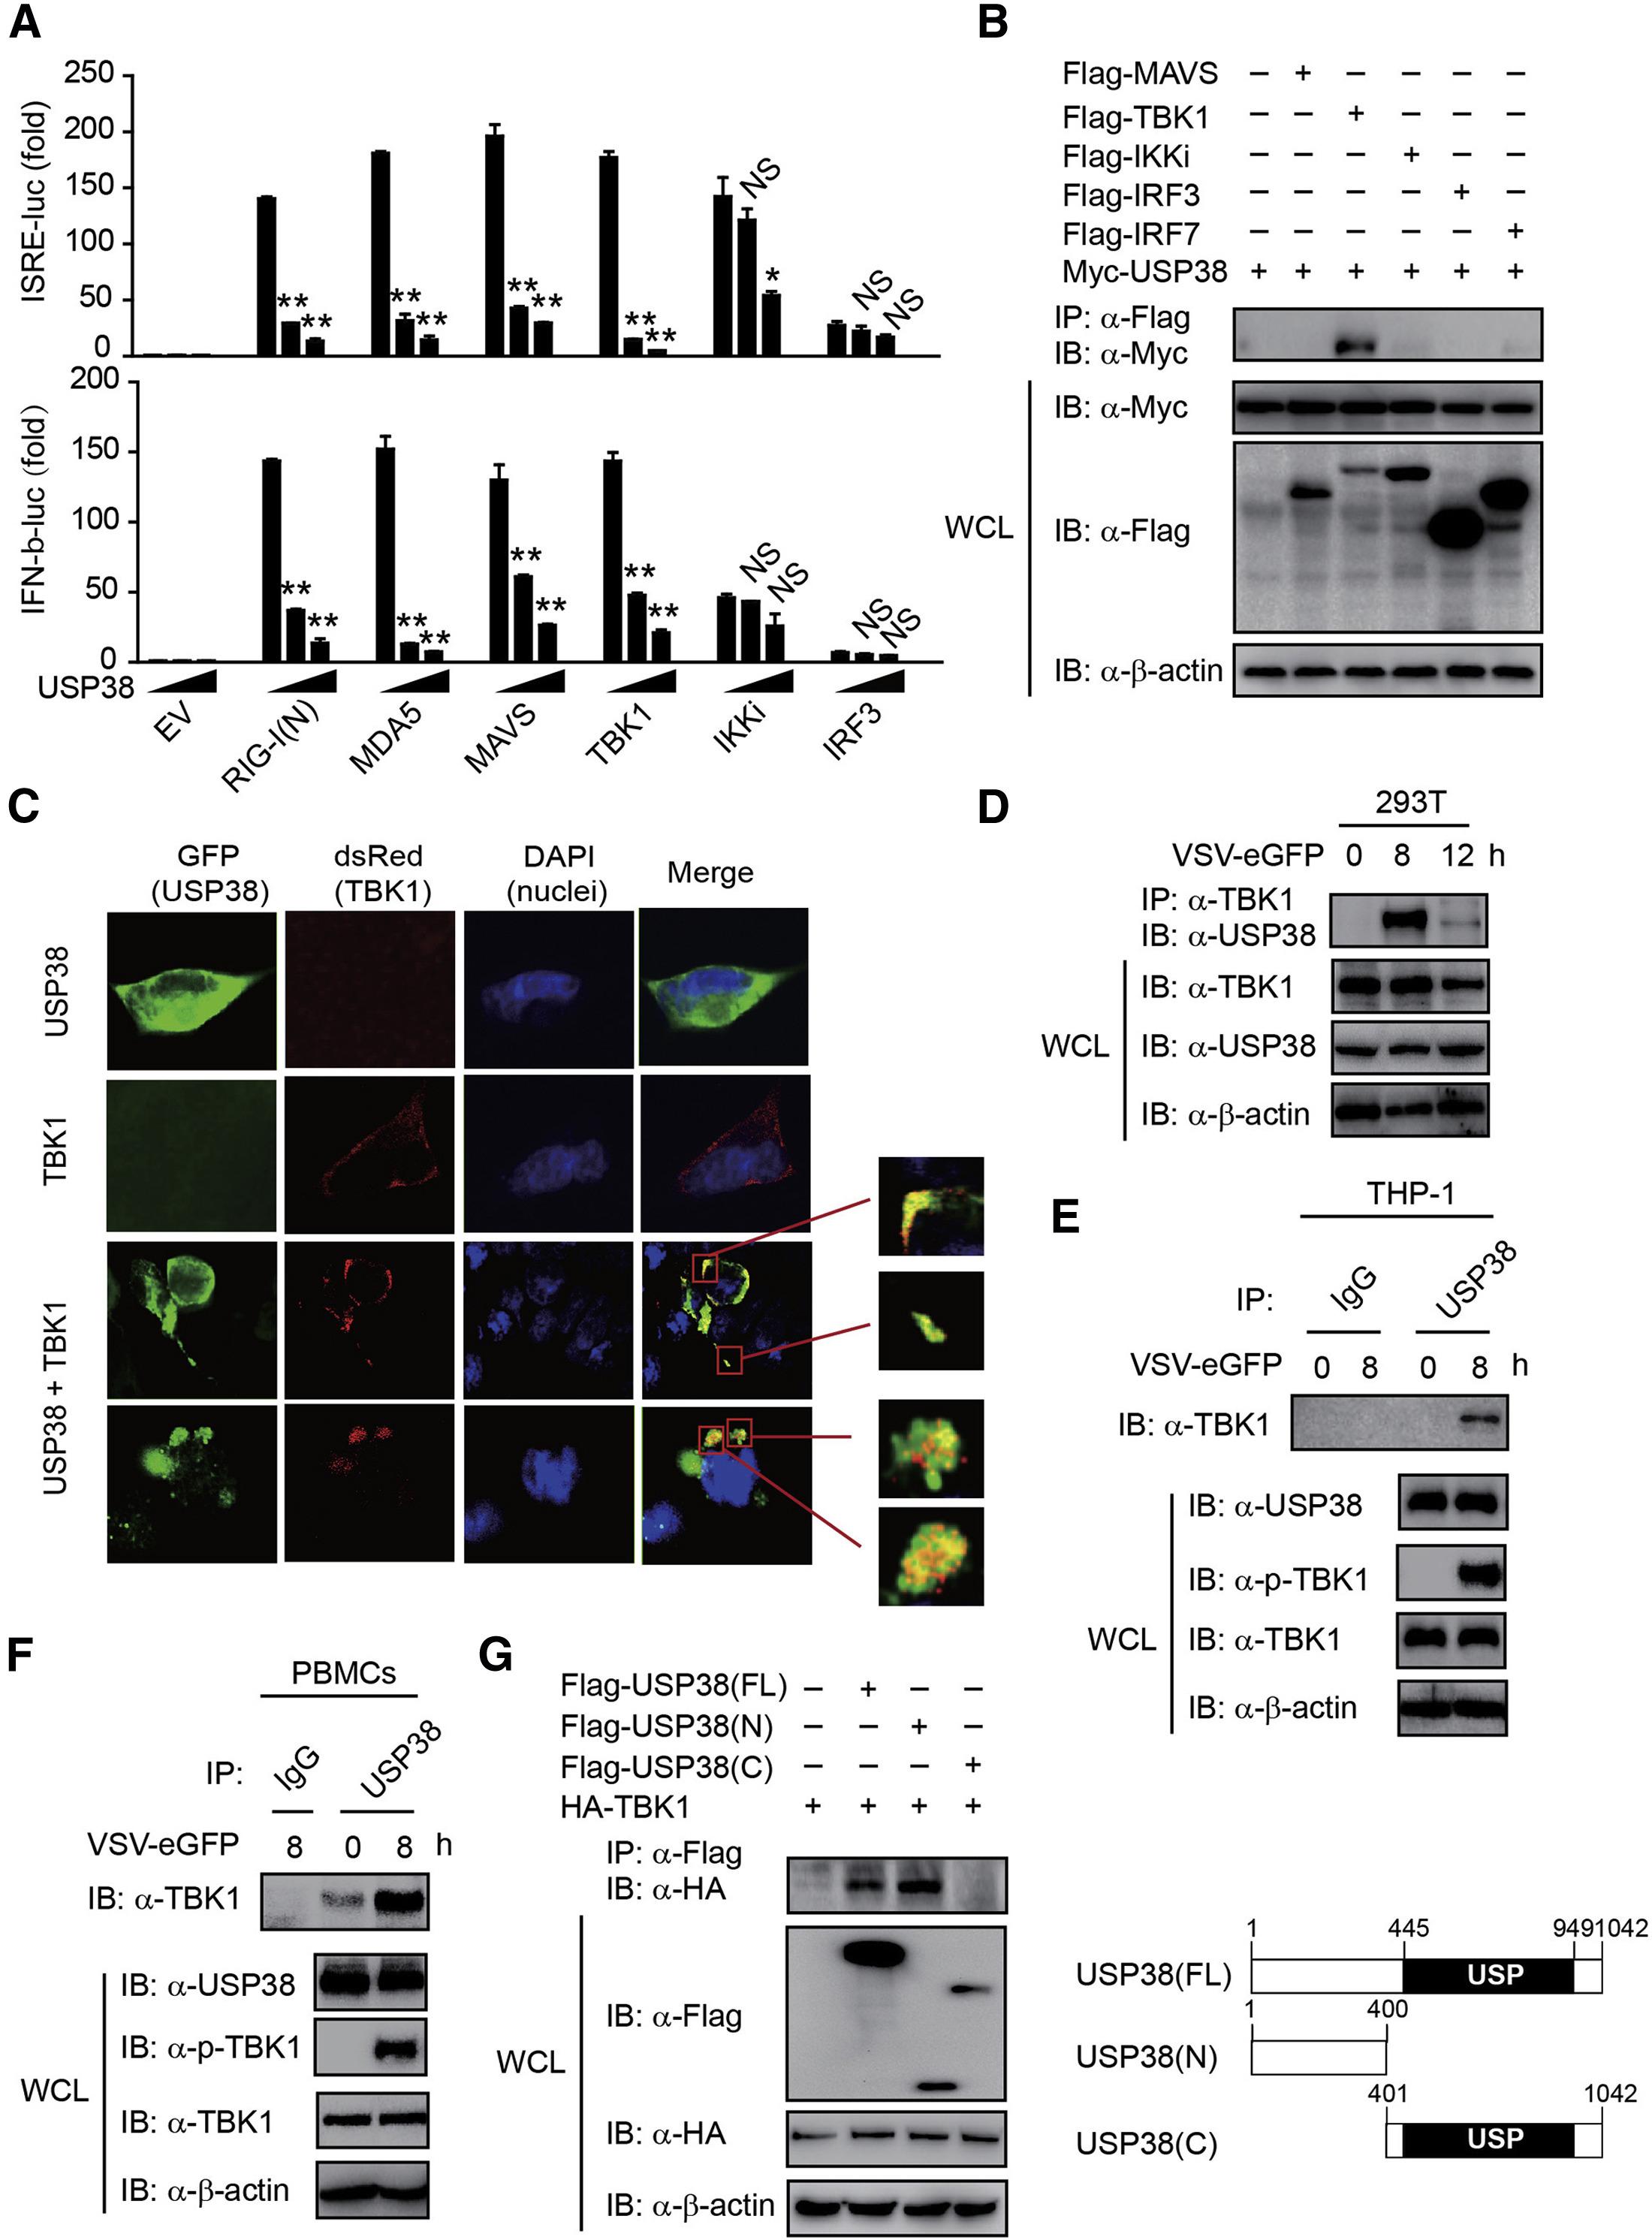 Usp38 Inhibits Type I Interferon Signaling By Editing Tbk1 Ubiquitination Through Nlrp4